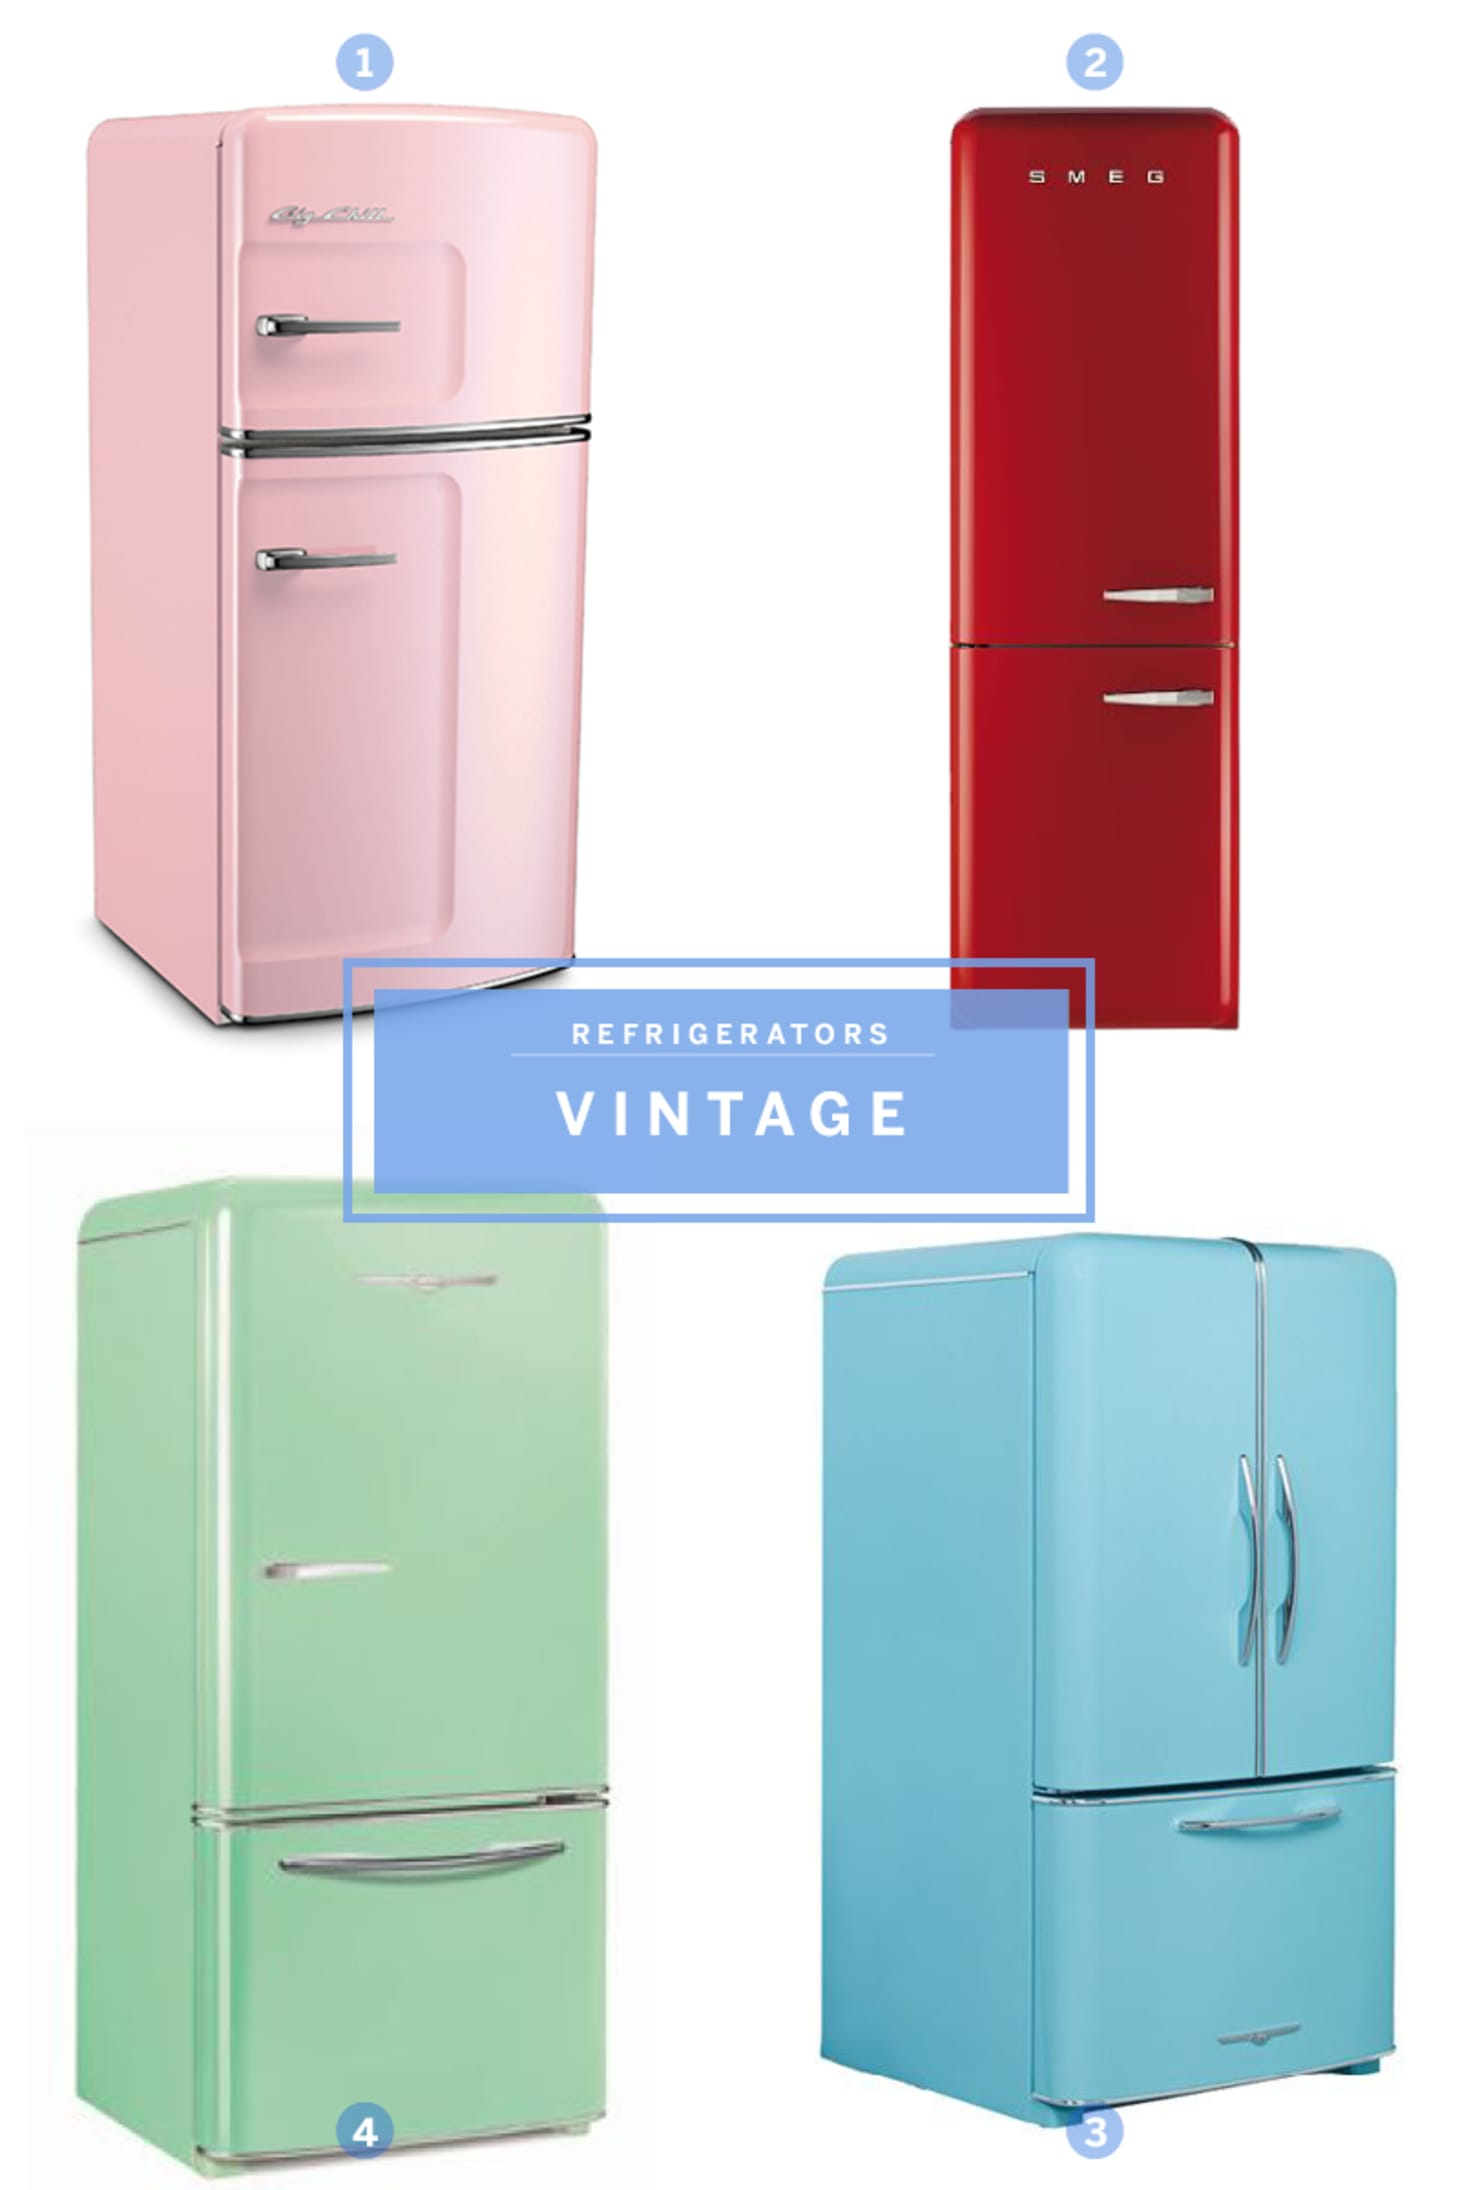 Best Refrigerators by Style: Modern, Vintage & Industrial